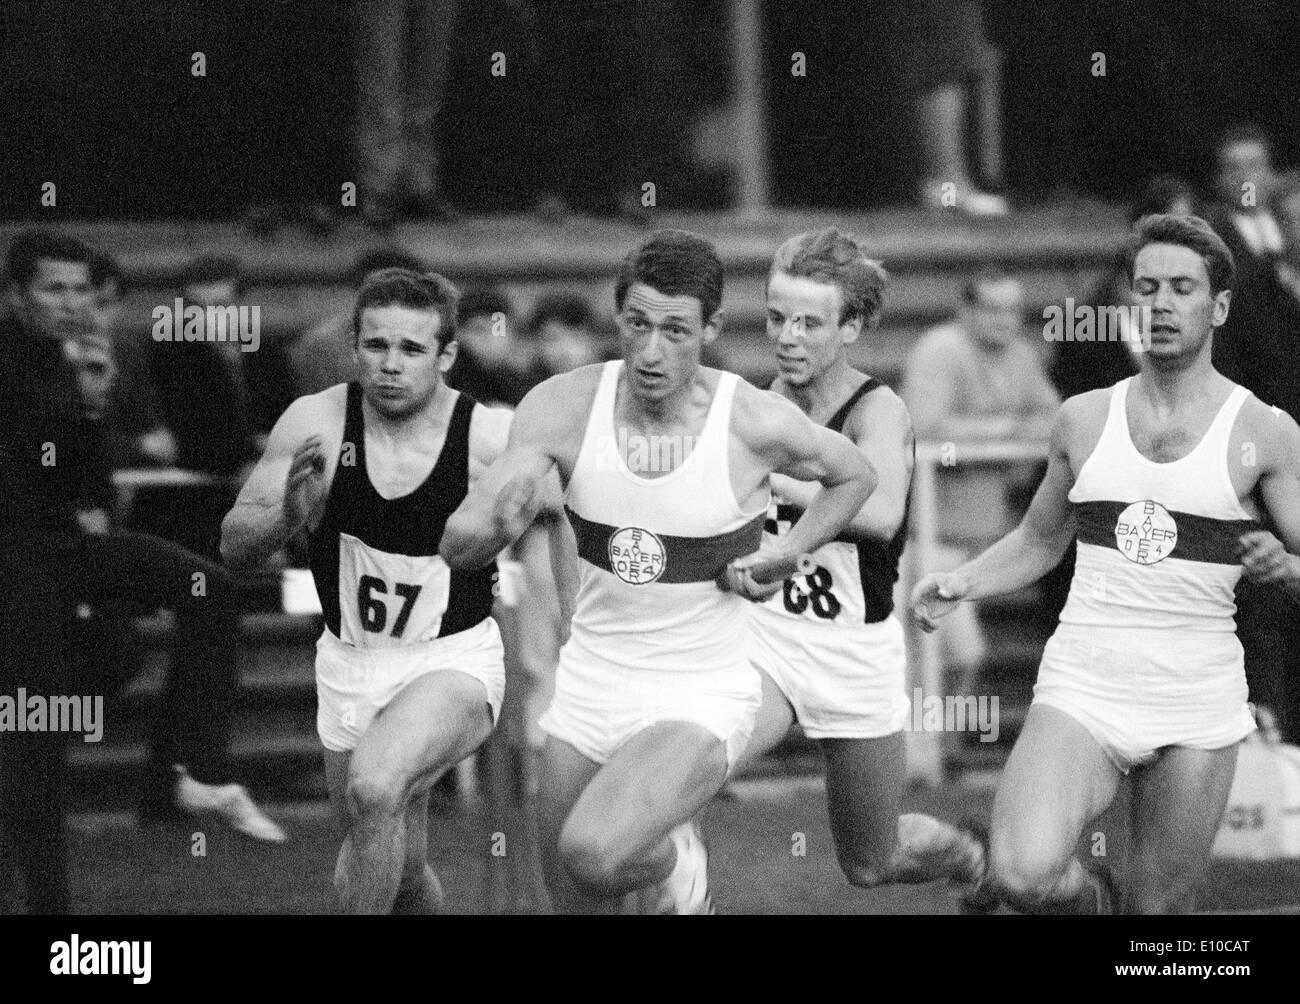 Sixties, black and white photo, sports, athletics, International Meeting in Athletics 1966 in Krefeld-Uerdingen, track racing, sprint, 4 x 100 metres relay, men, changeover, team of Bayer Leverkusen, Johannes Jo Kaiser (2.f.l.), D-Krefeld, D-Krefeld-Uerdi - Stock Image